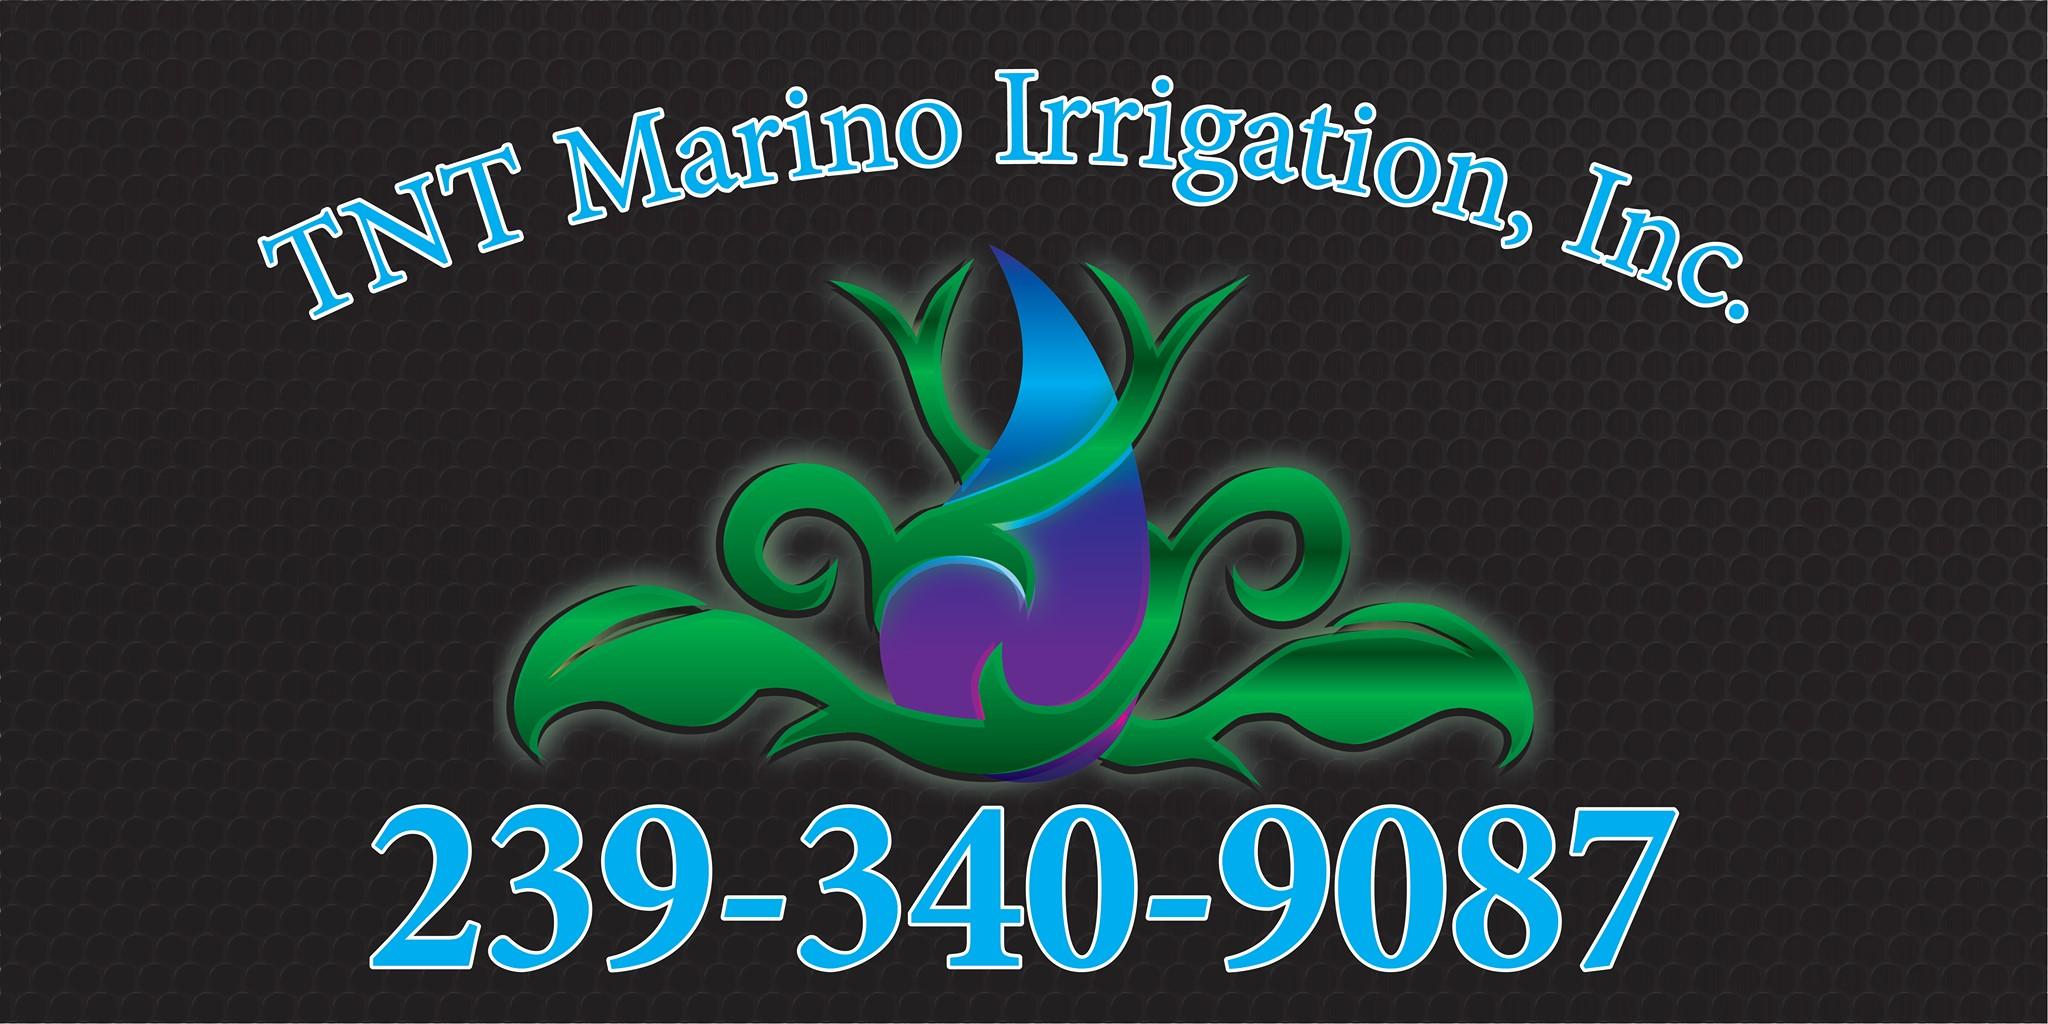 TNT Marino Irrigation Inc.